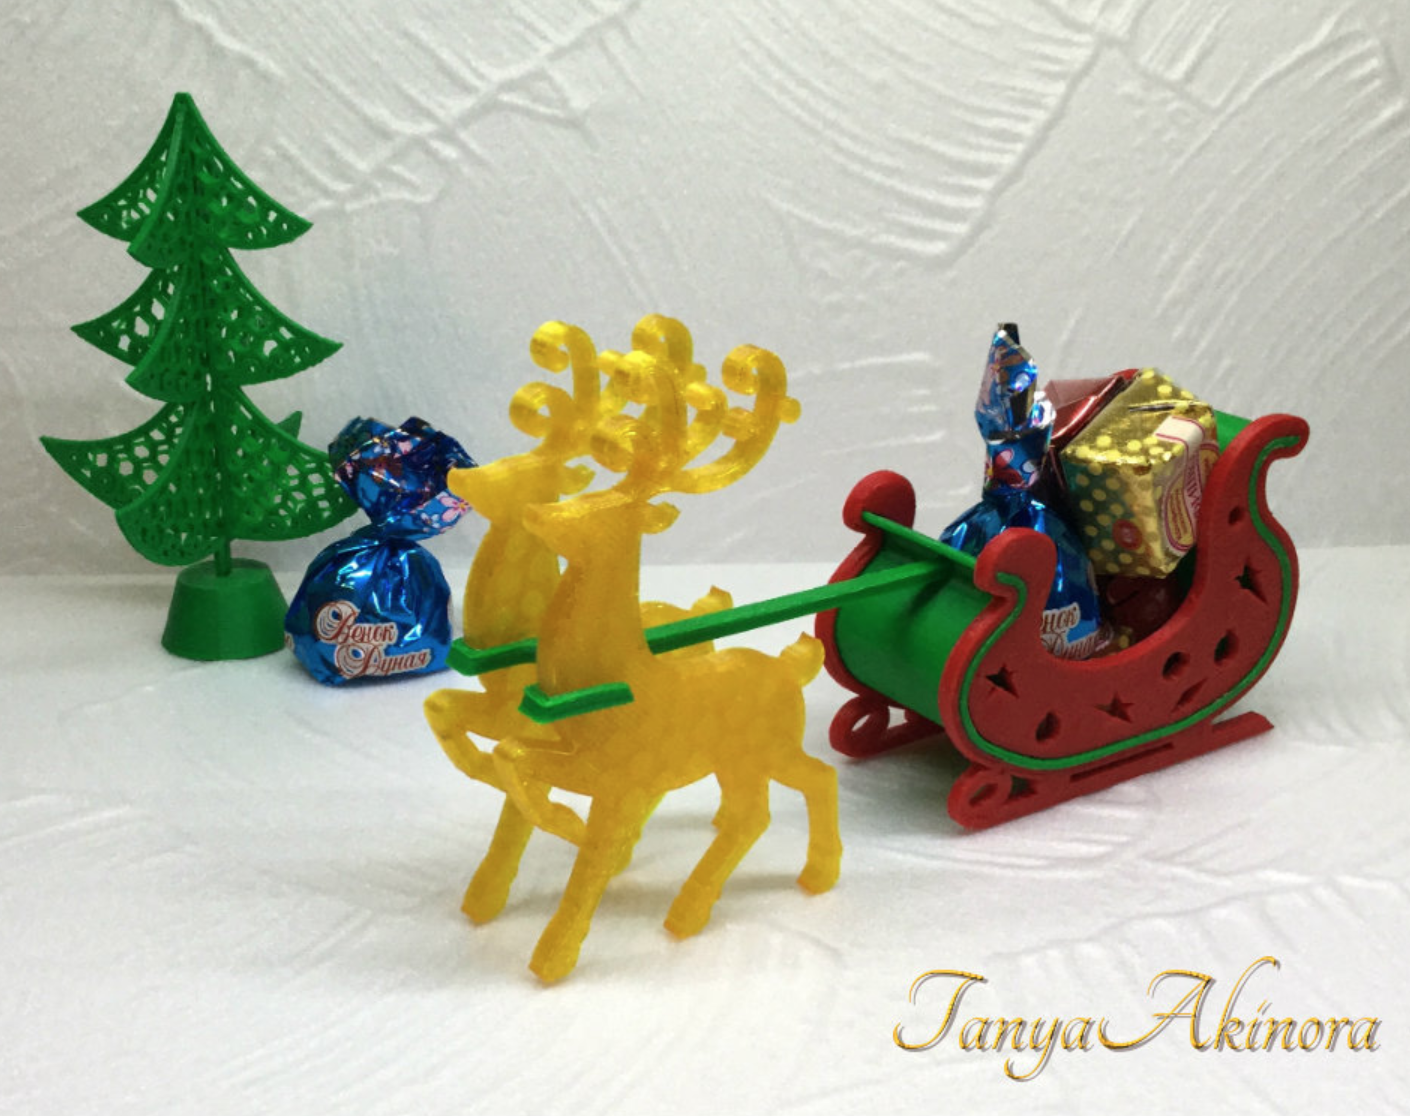 Capture d'écran 2017-12-12 à 17.19.34.png Download free STL file Christmas deer • 3D print template, TanyaAkinora